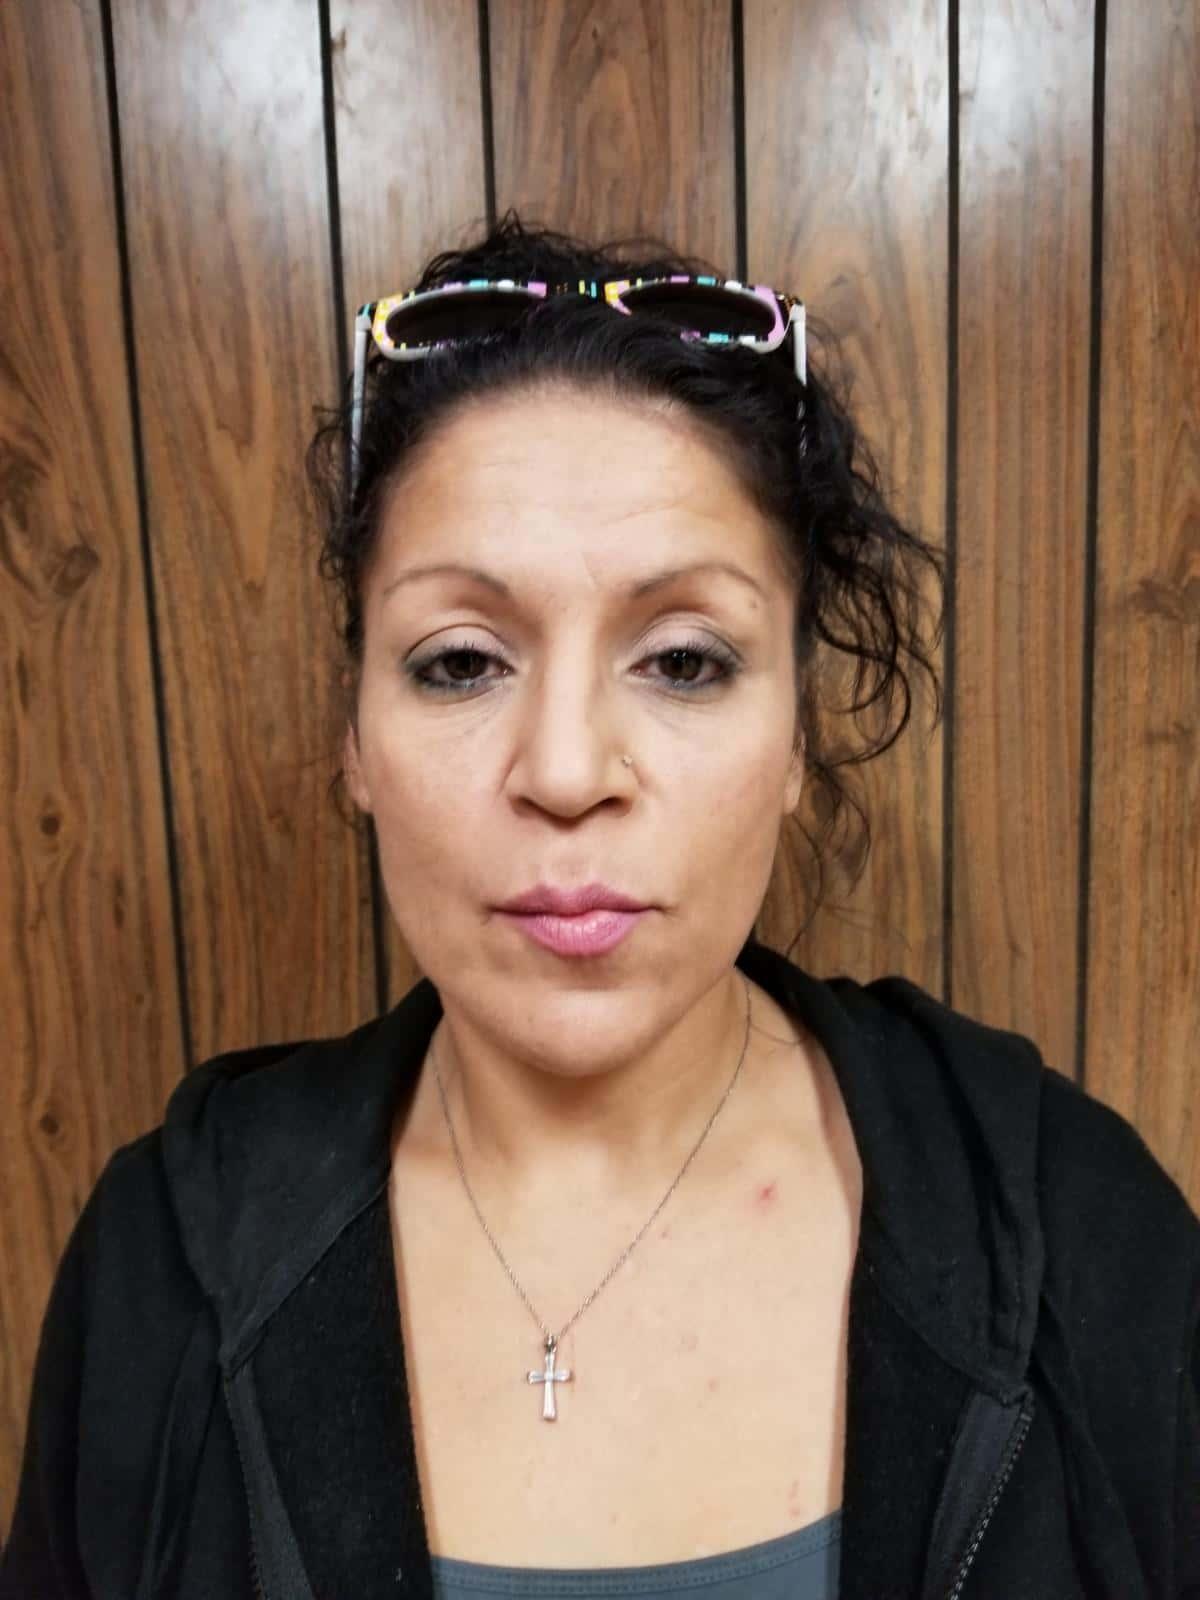 Mendota Woman Arrested on Drug Charge | WGLC